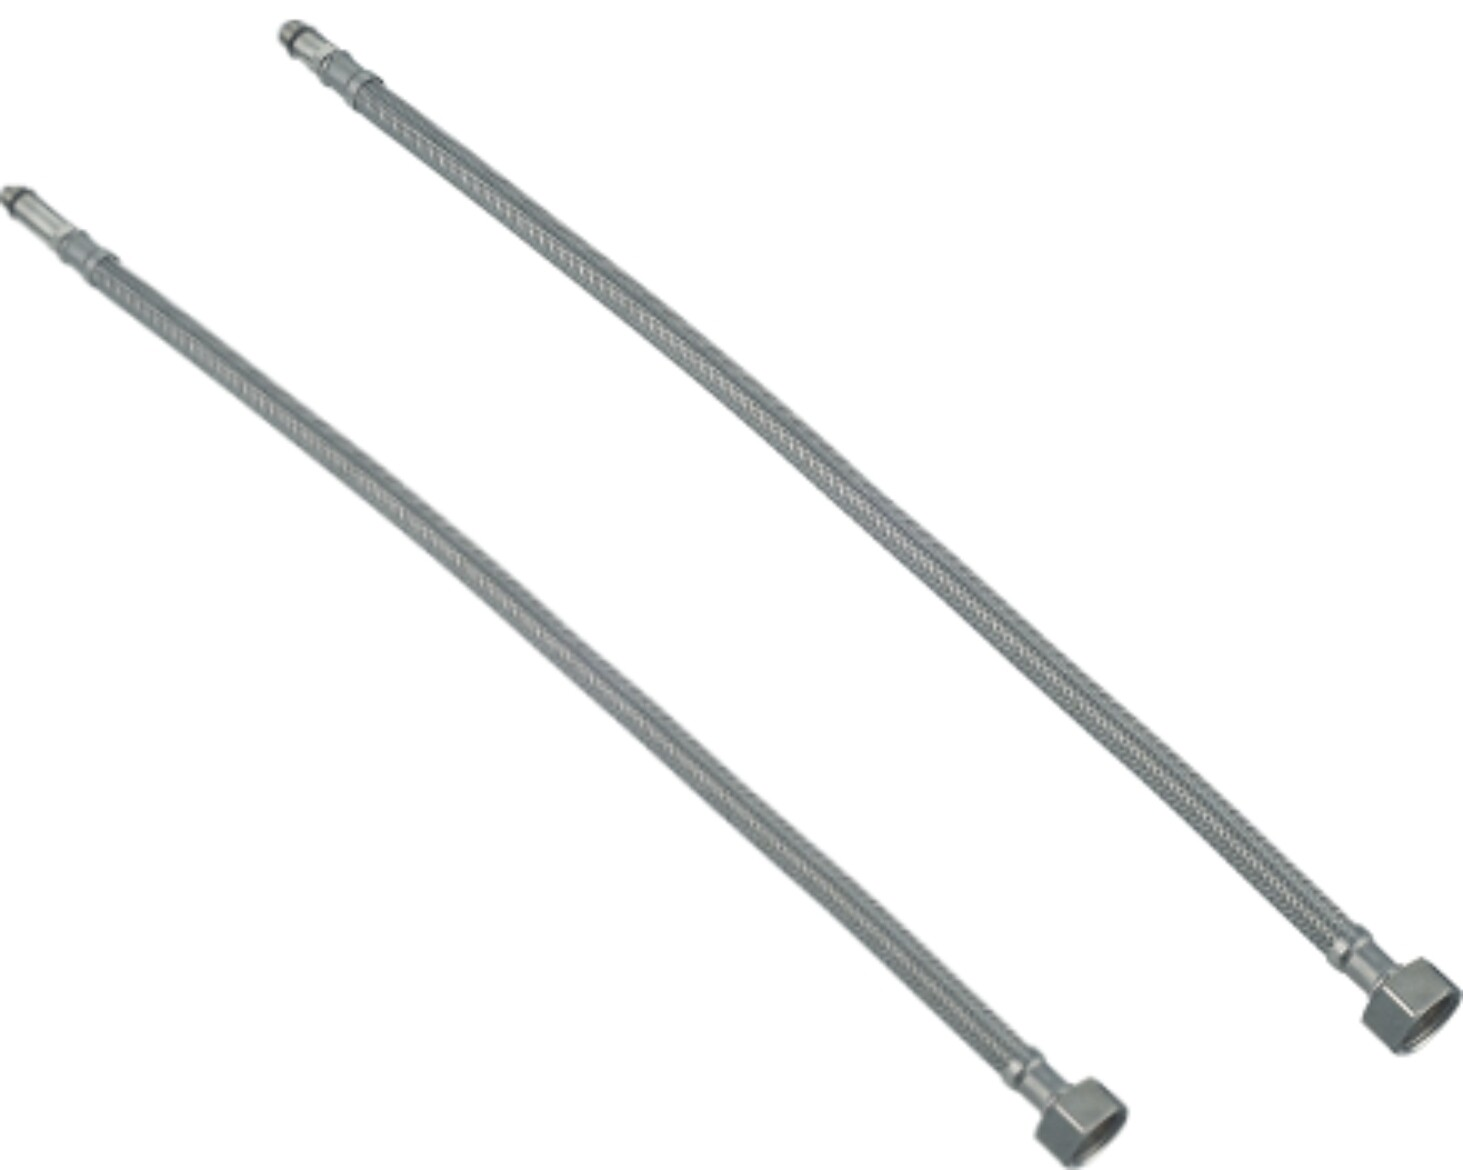 "Flexibles inox 1/2"" 50cm"